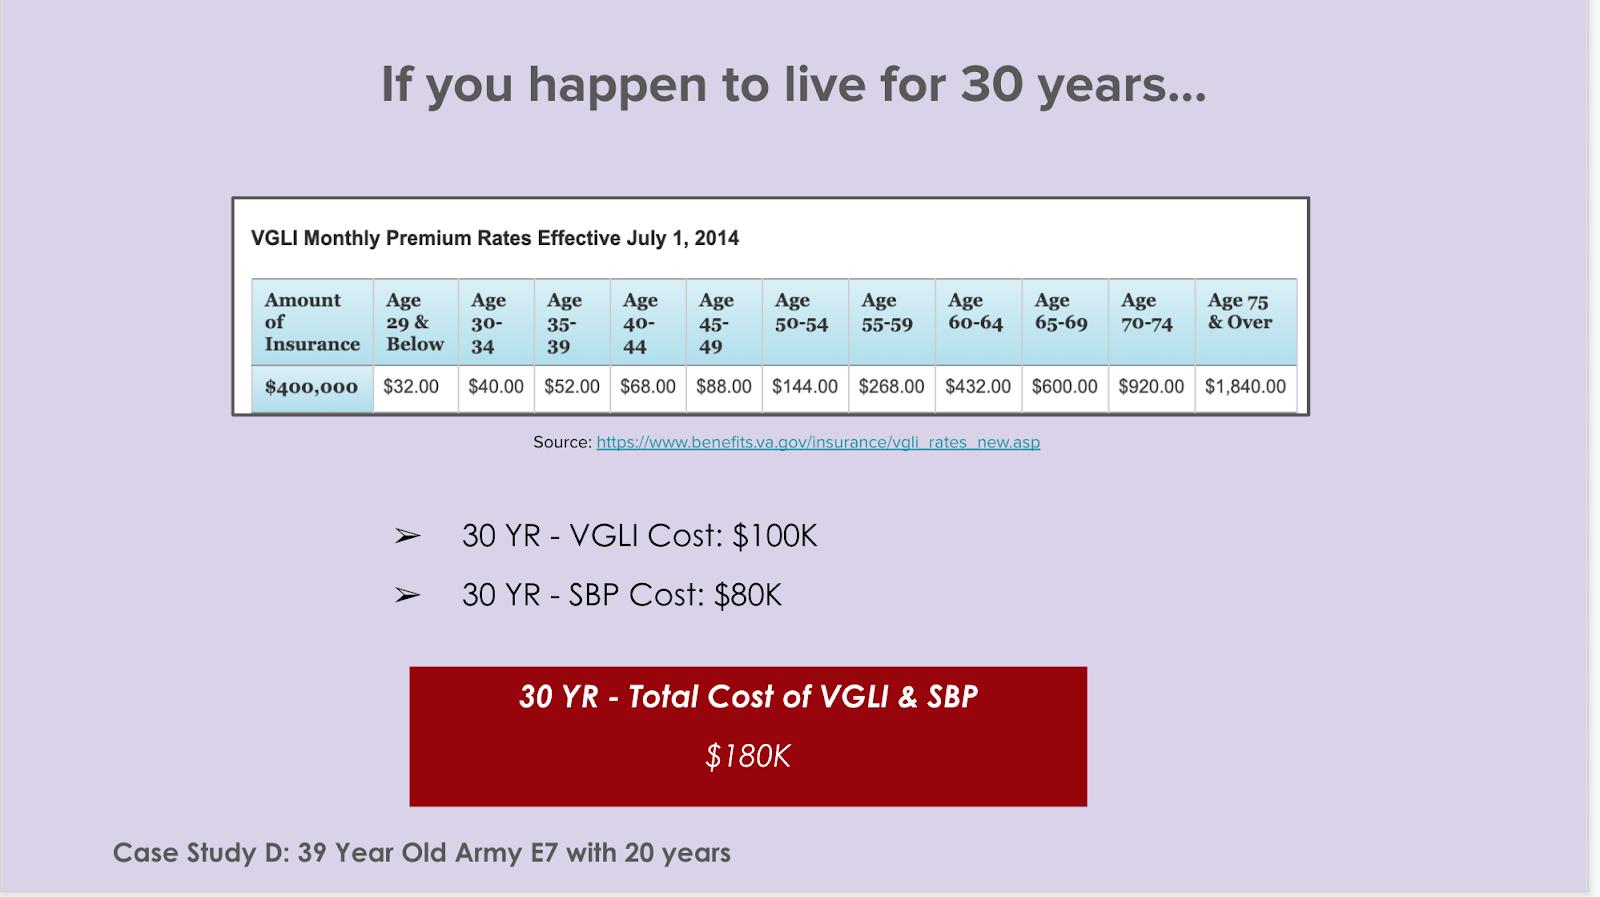 VGLI costs